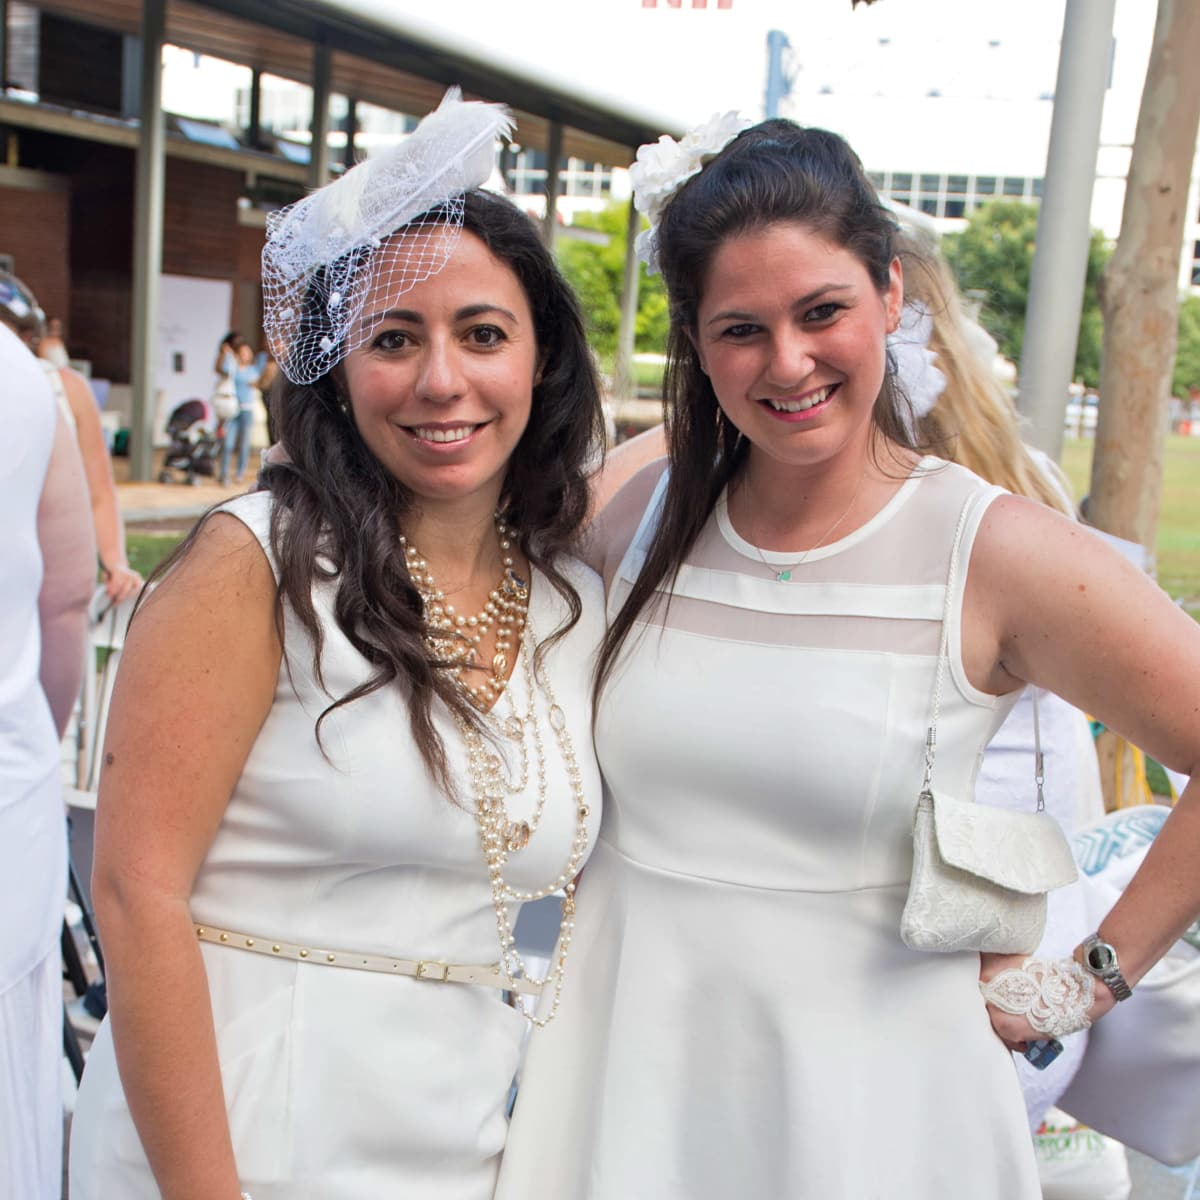 Houston, Diner en Blanc, June 2015, Sandy Safi, Samantha Vandzura